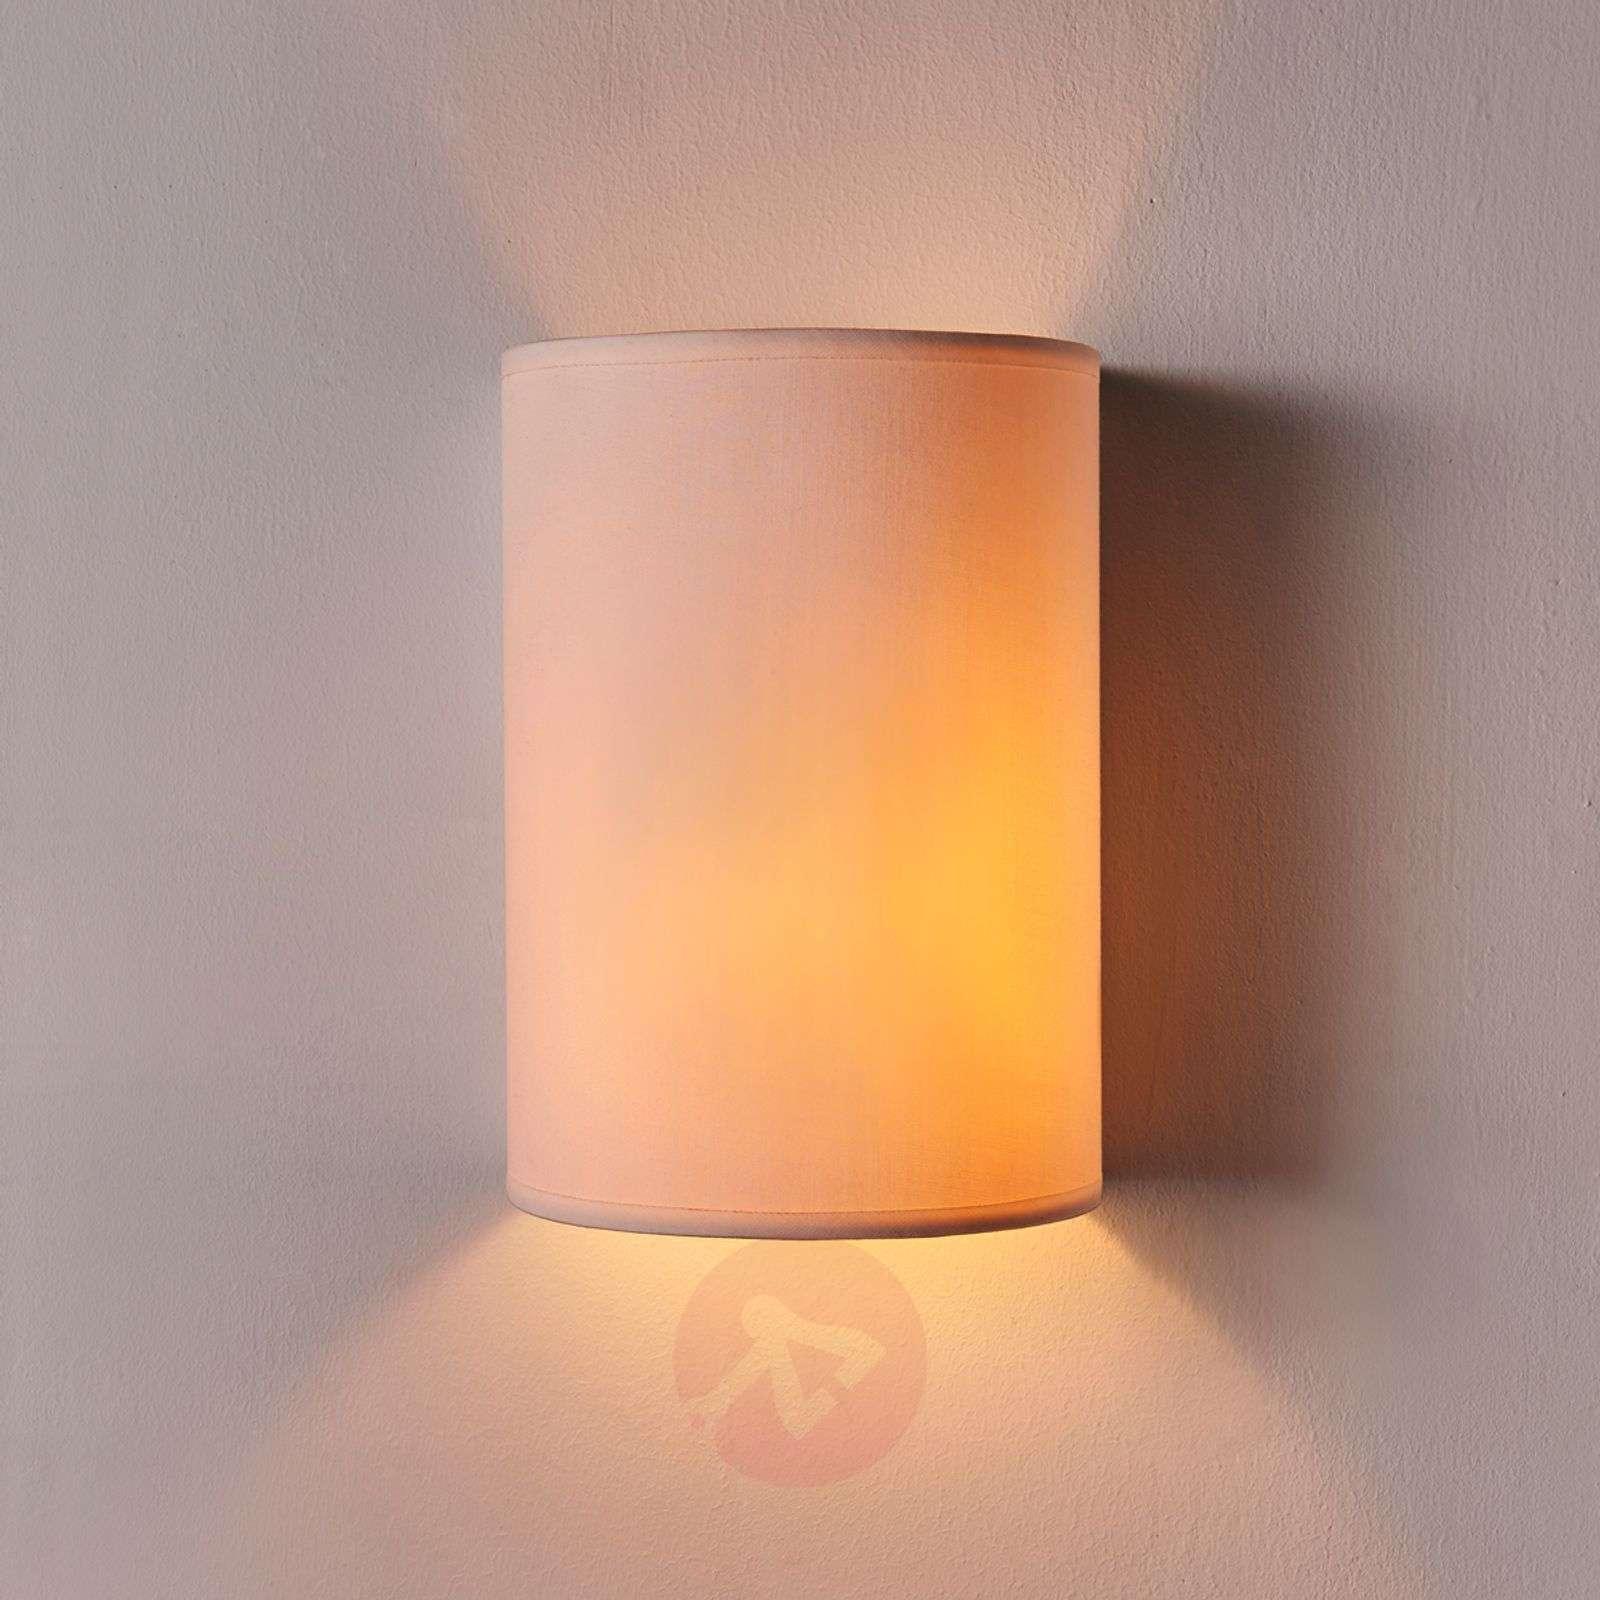 Semicylindrical fabric wall light Annalisa, white-9620875-02